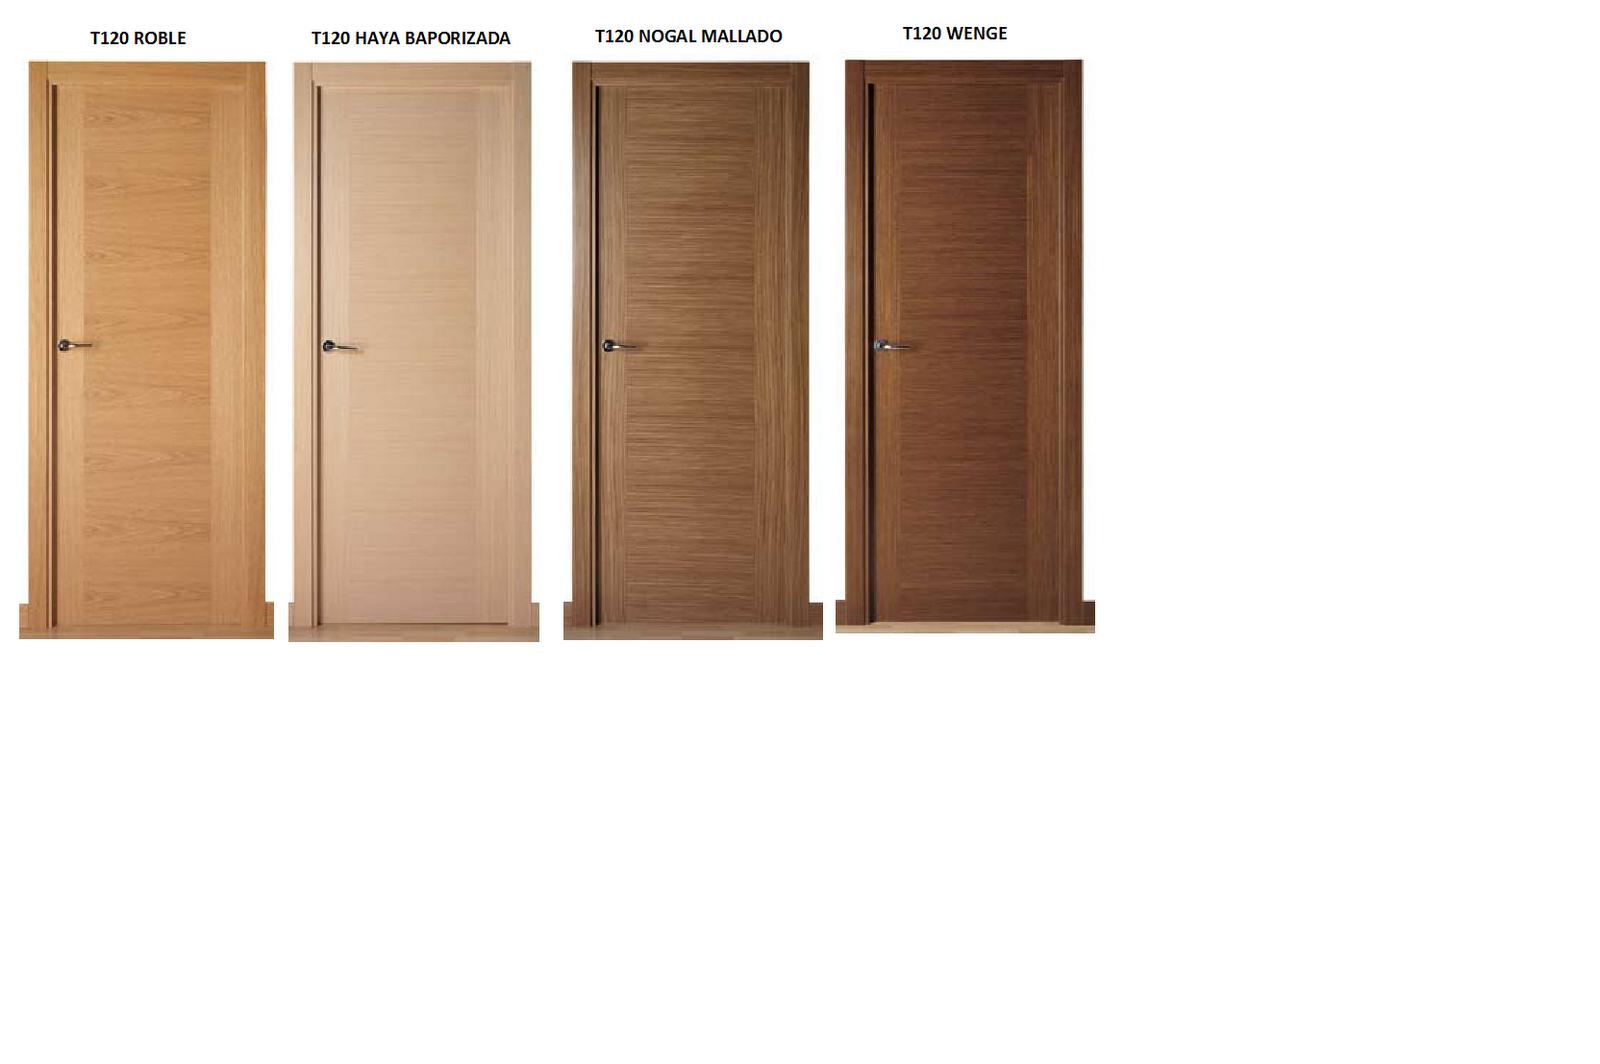 Puertas de exterior e interior - Puertas madera interior ...